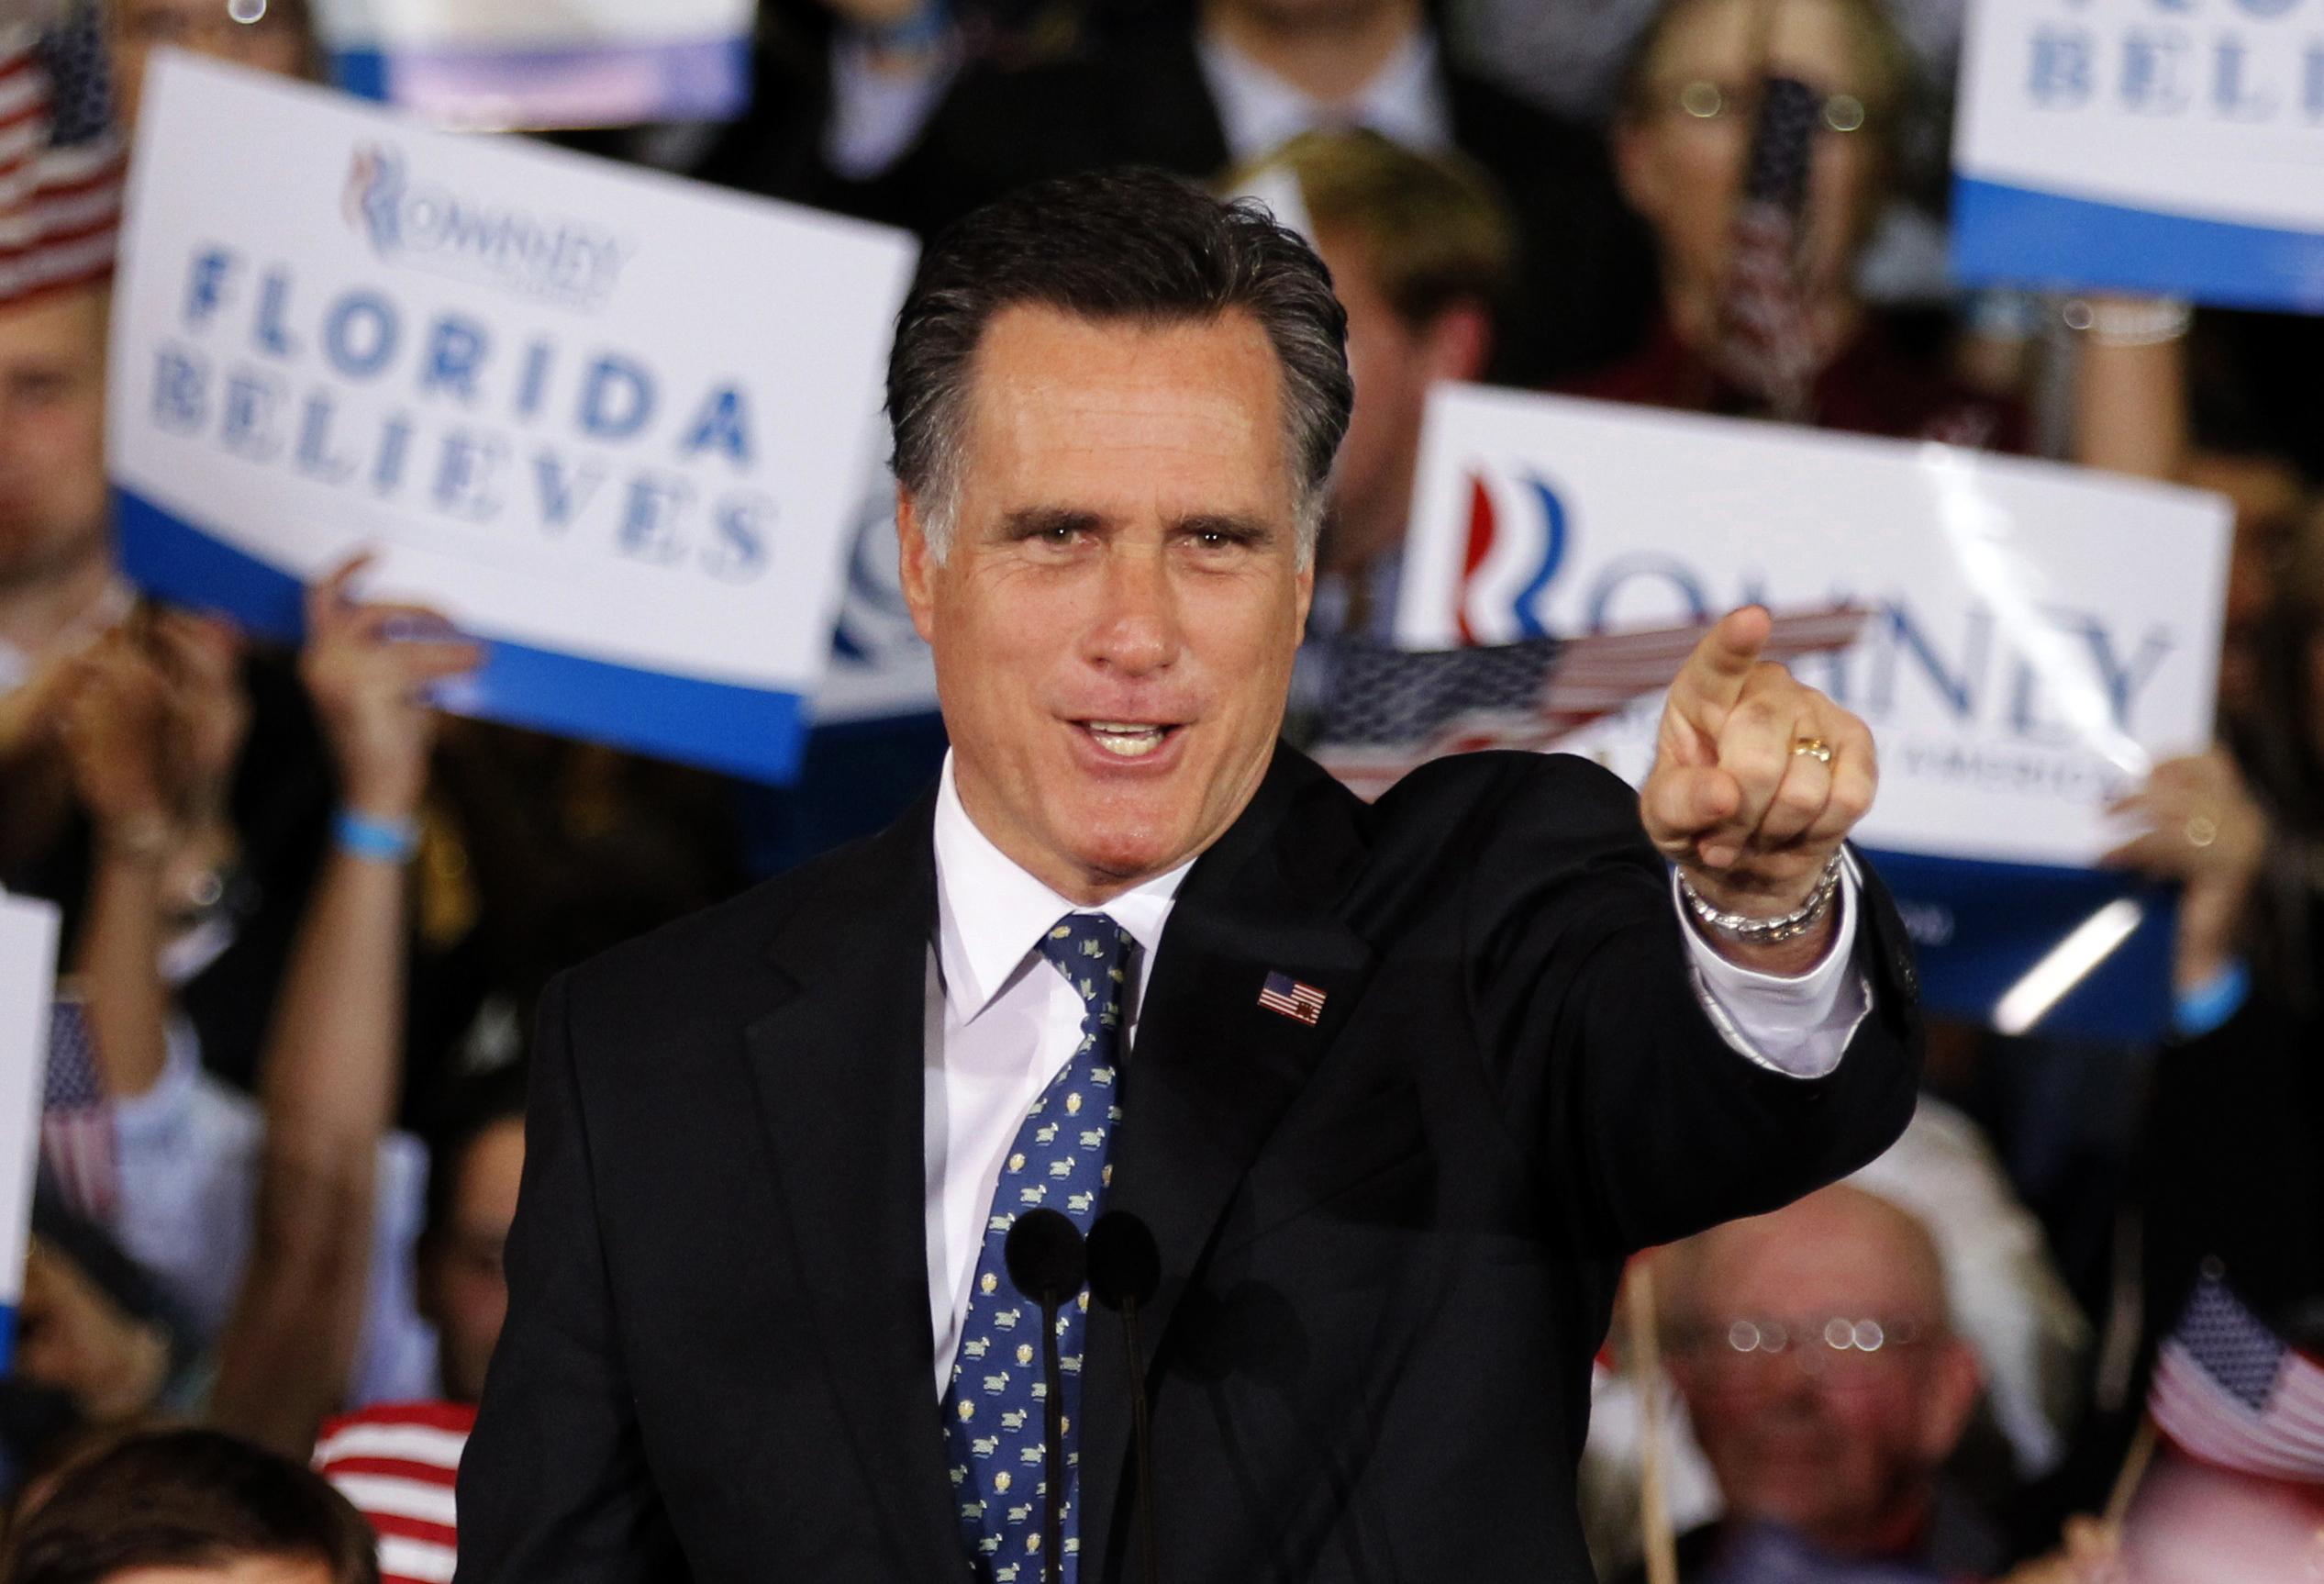 Governor Romney quote #2